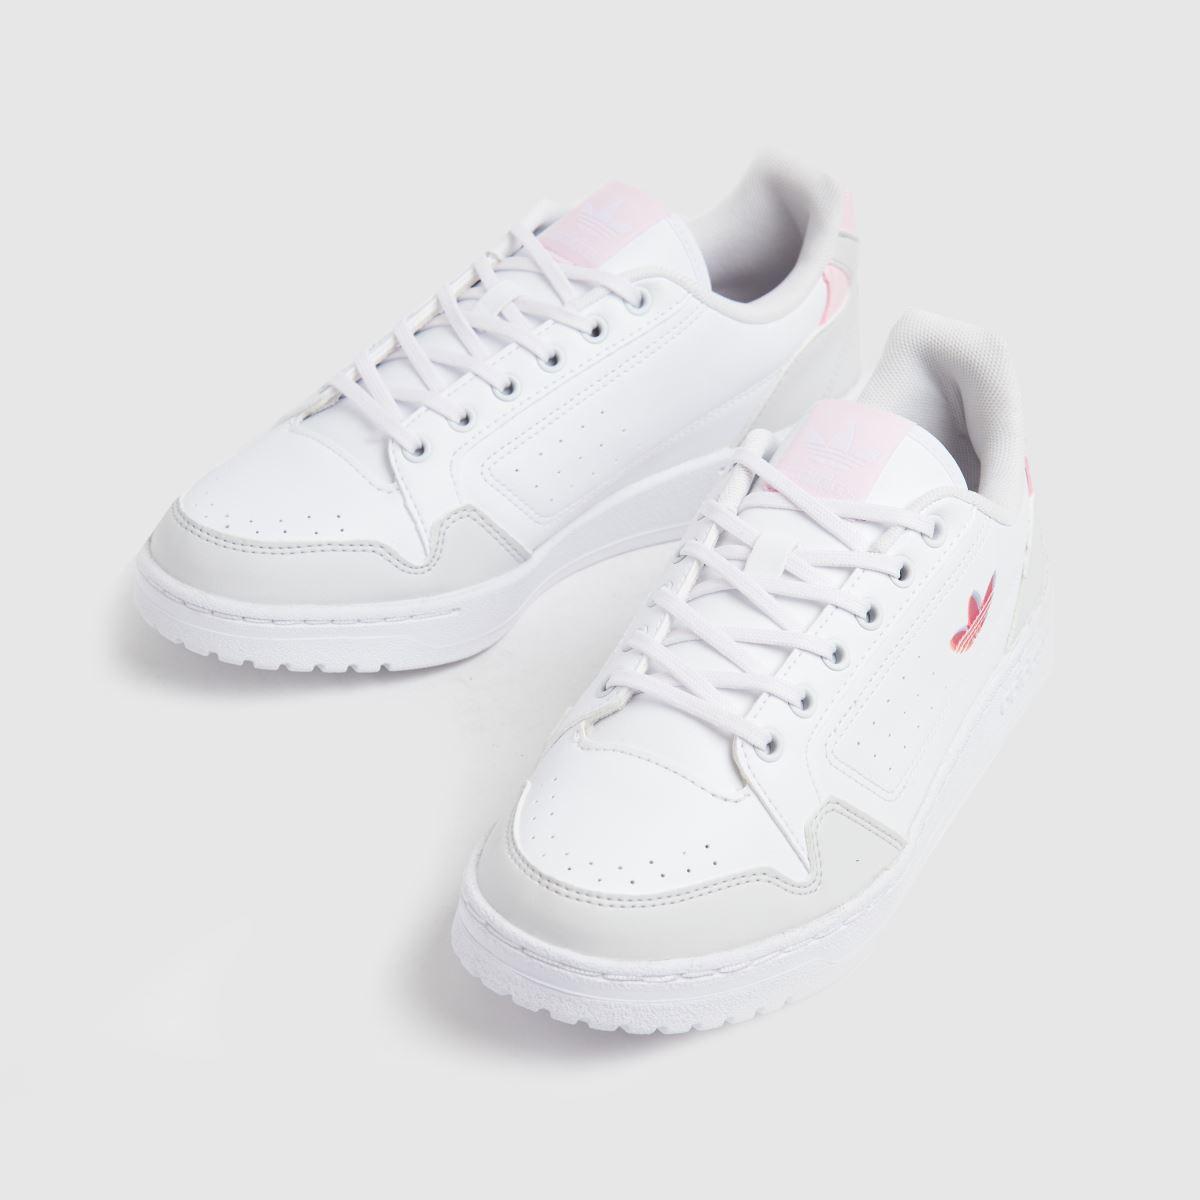 Damen | Weiß-pink adidas Deerupt Sneaker | Damen schuh Gute Qualität beliebte Schuhe 0ef641